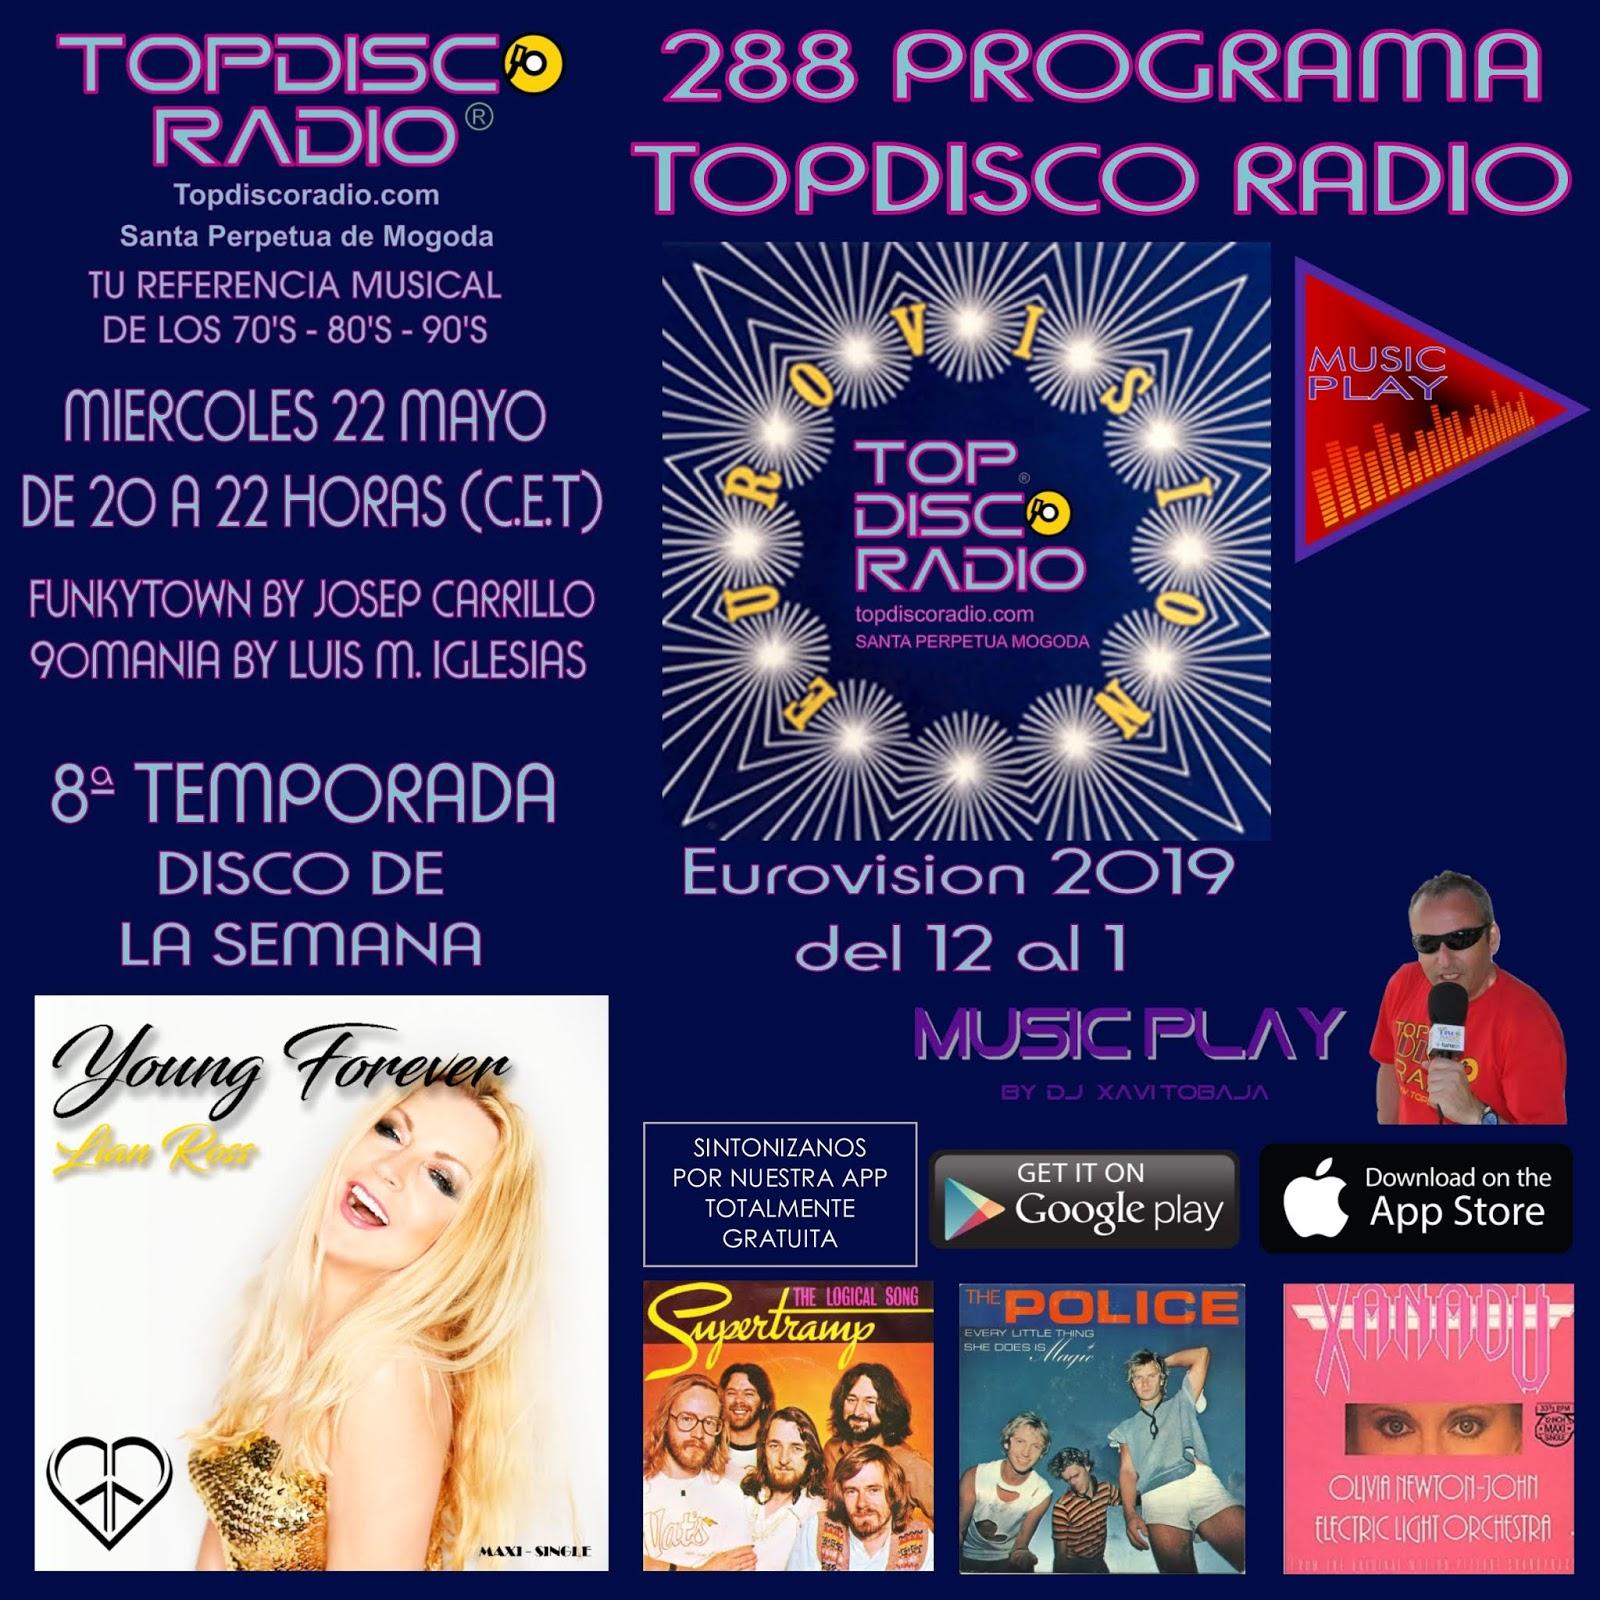 288 Programa Topdisco Radio